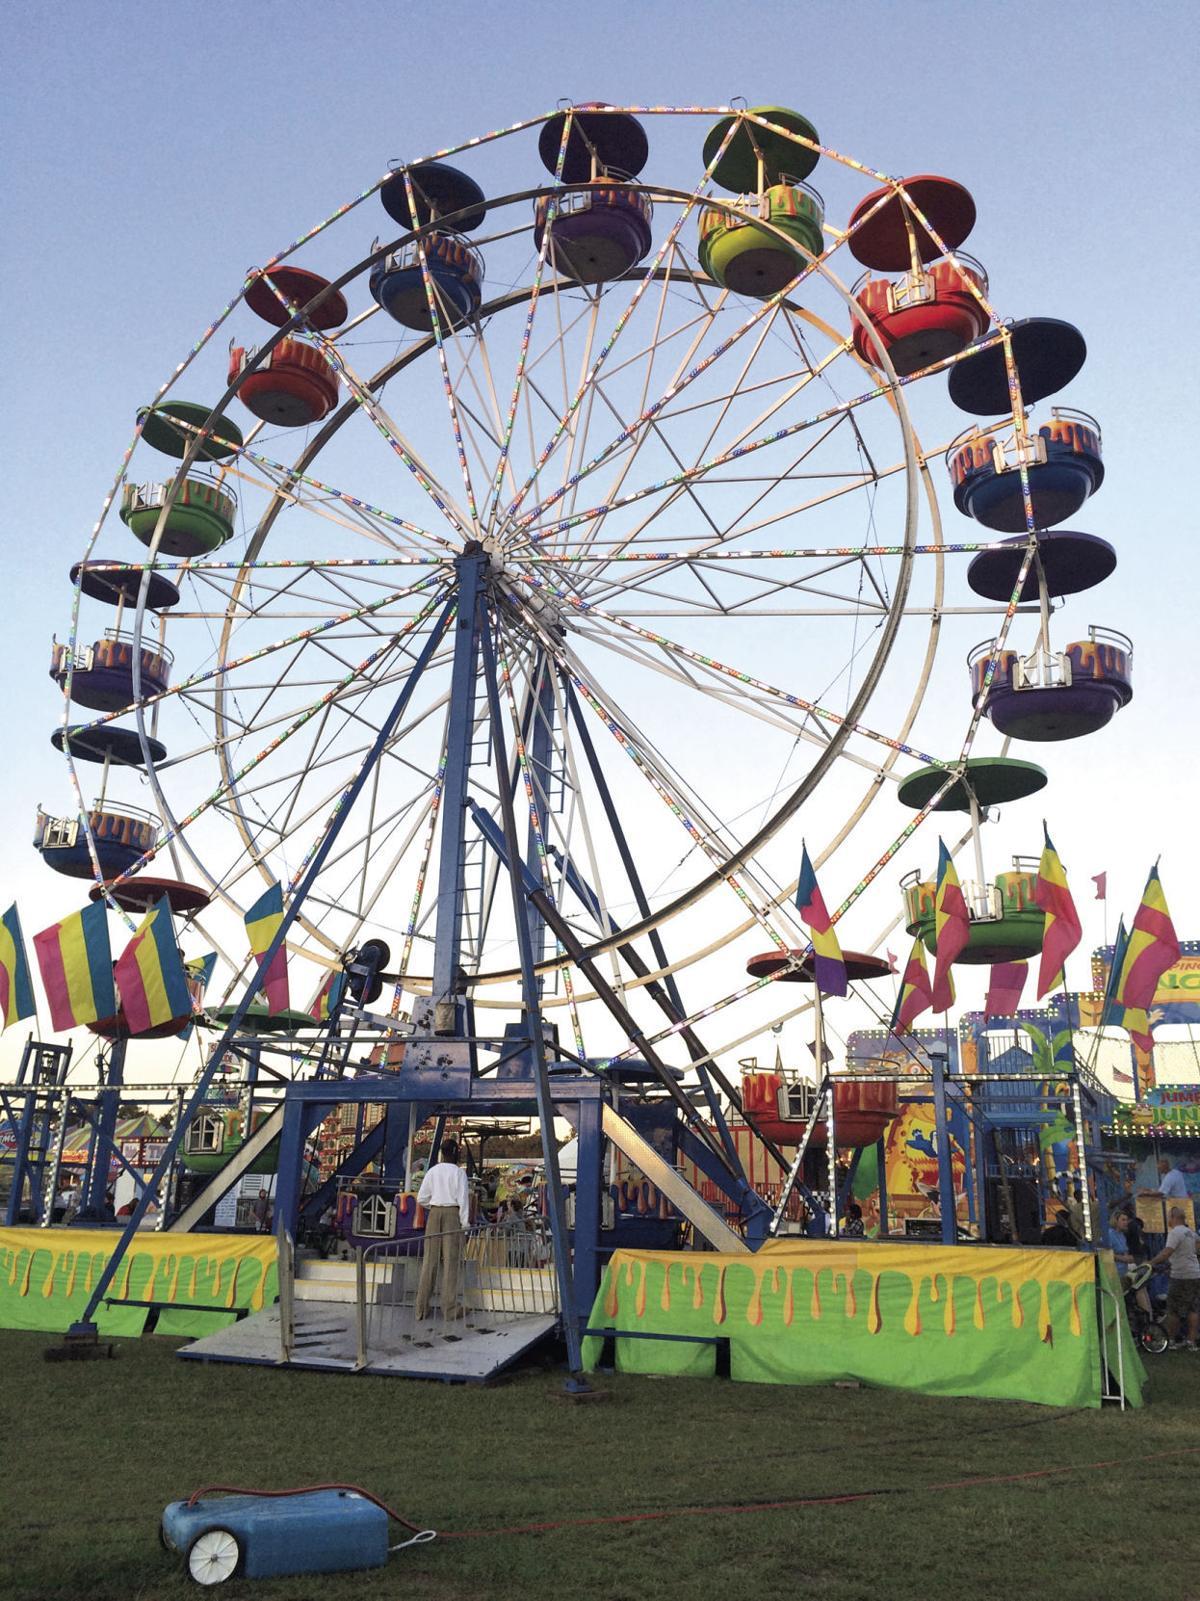 Visit the Orangeburg County Fair